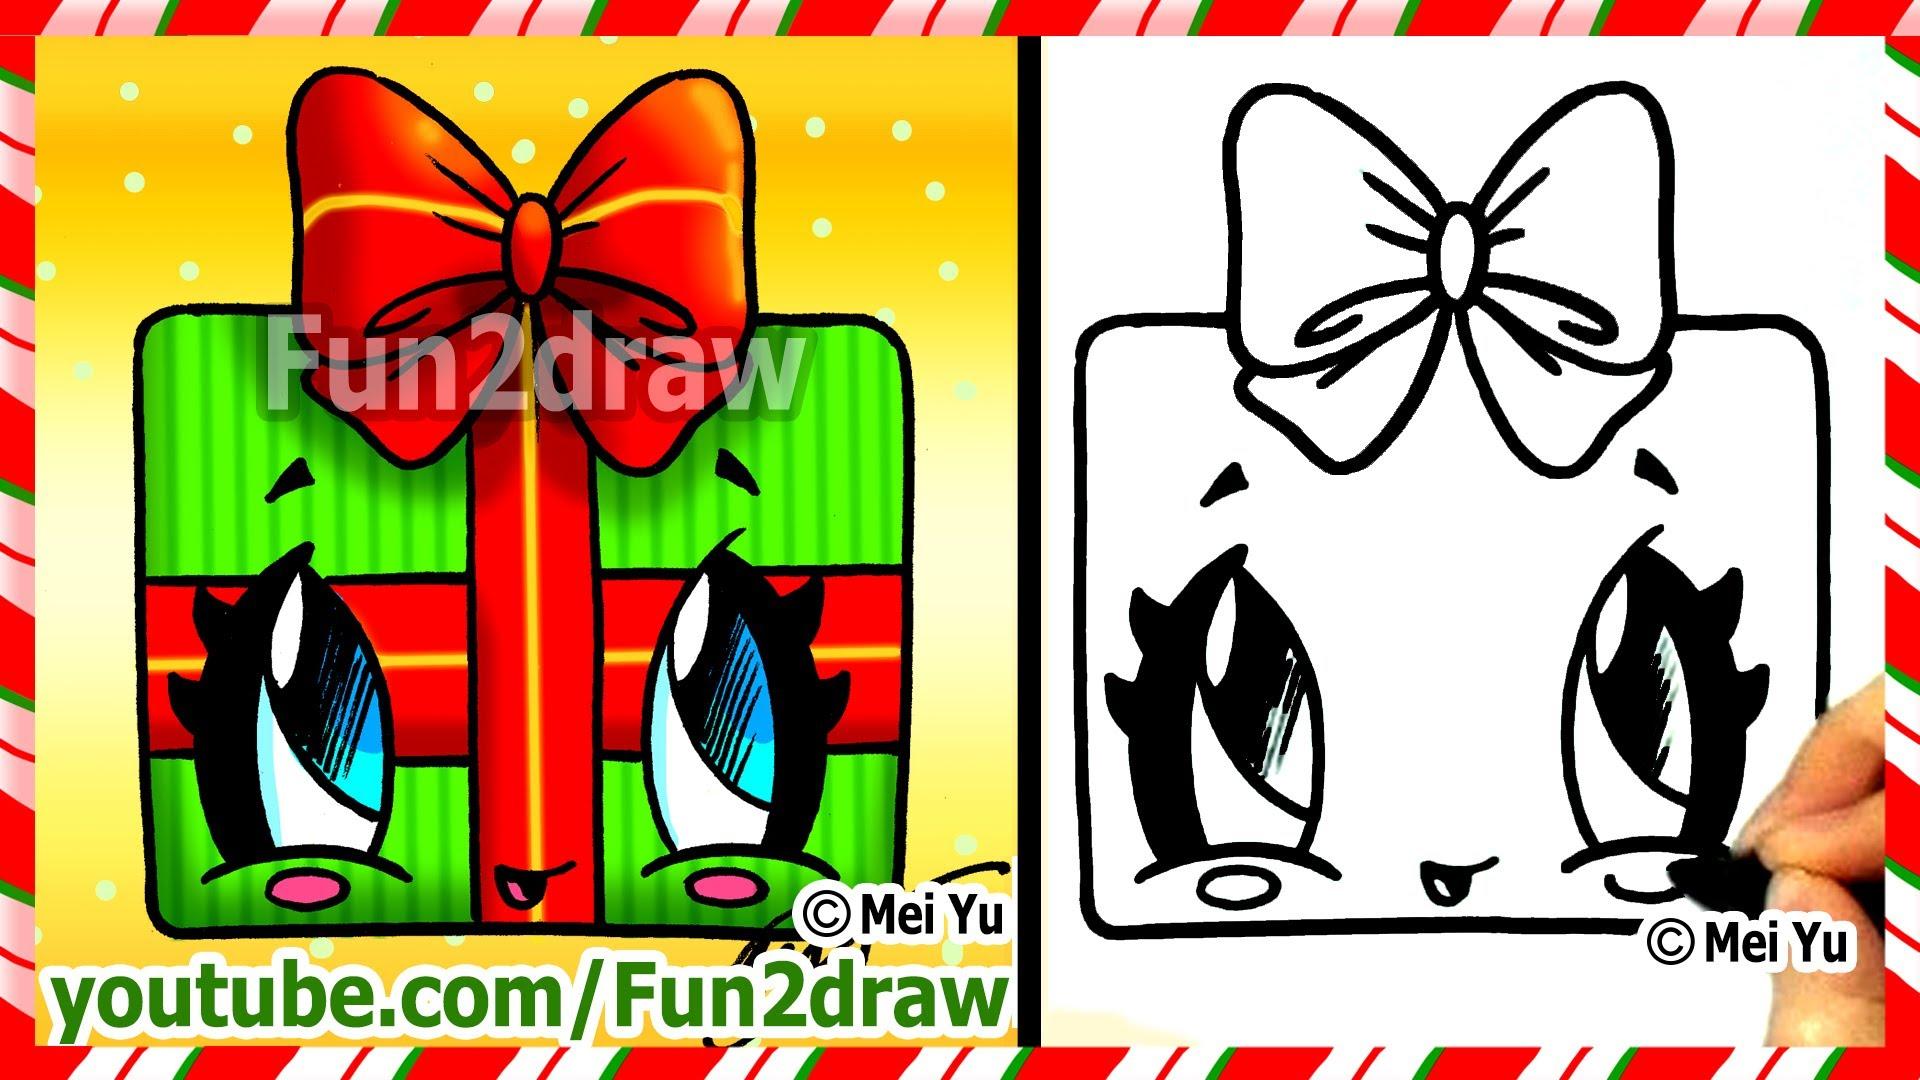 Drawn santa fun2draw Gift Bow Draw to How